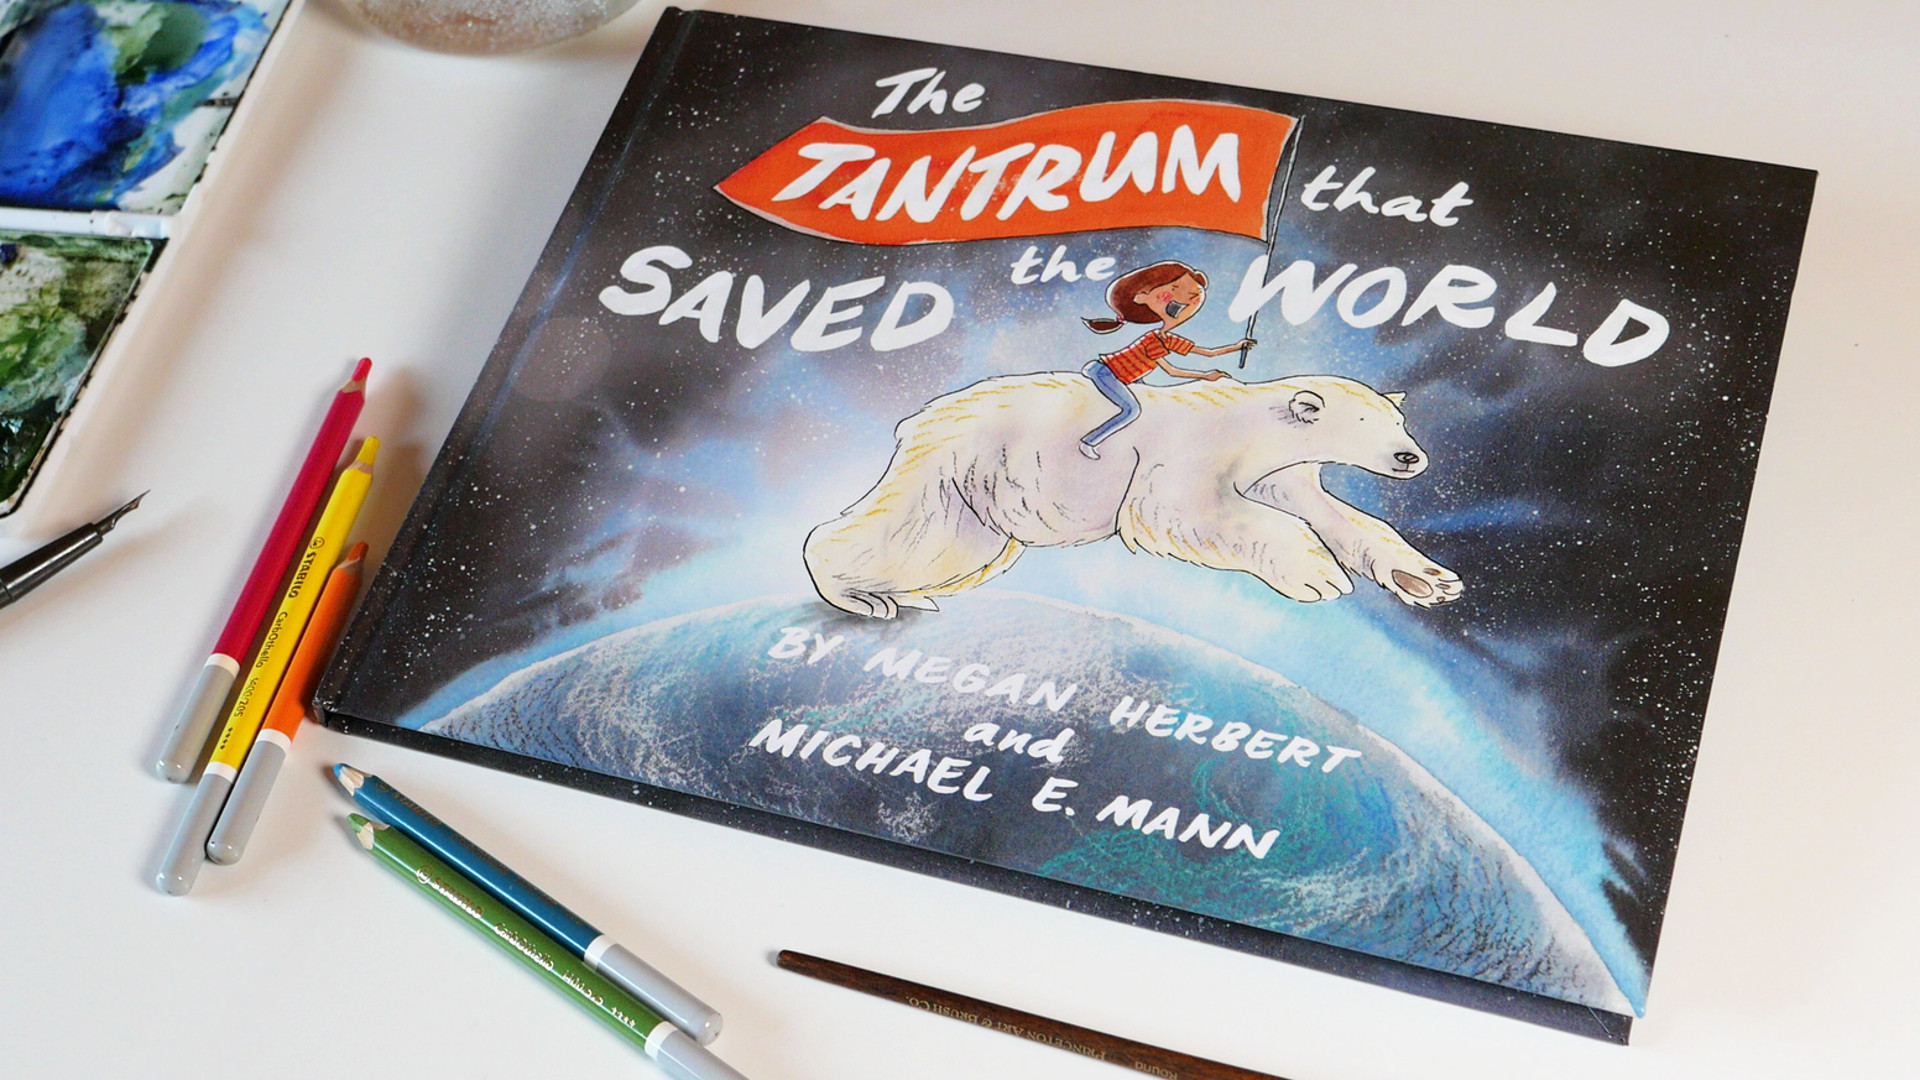 Tantrum that Saved the World